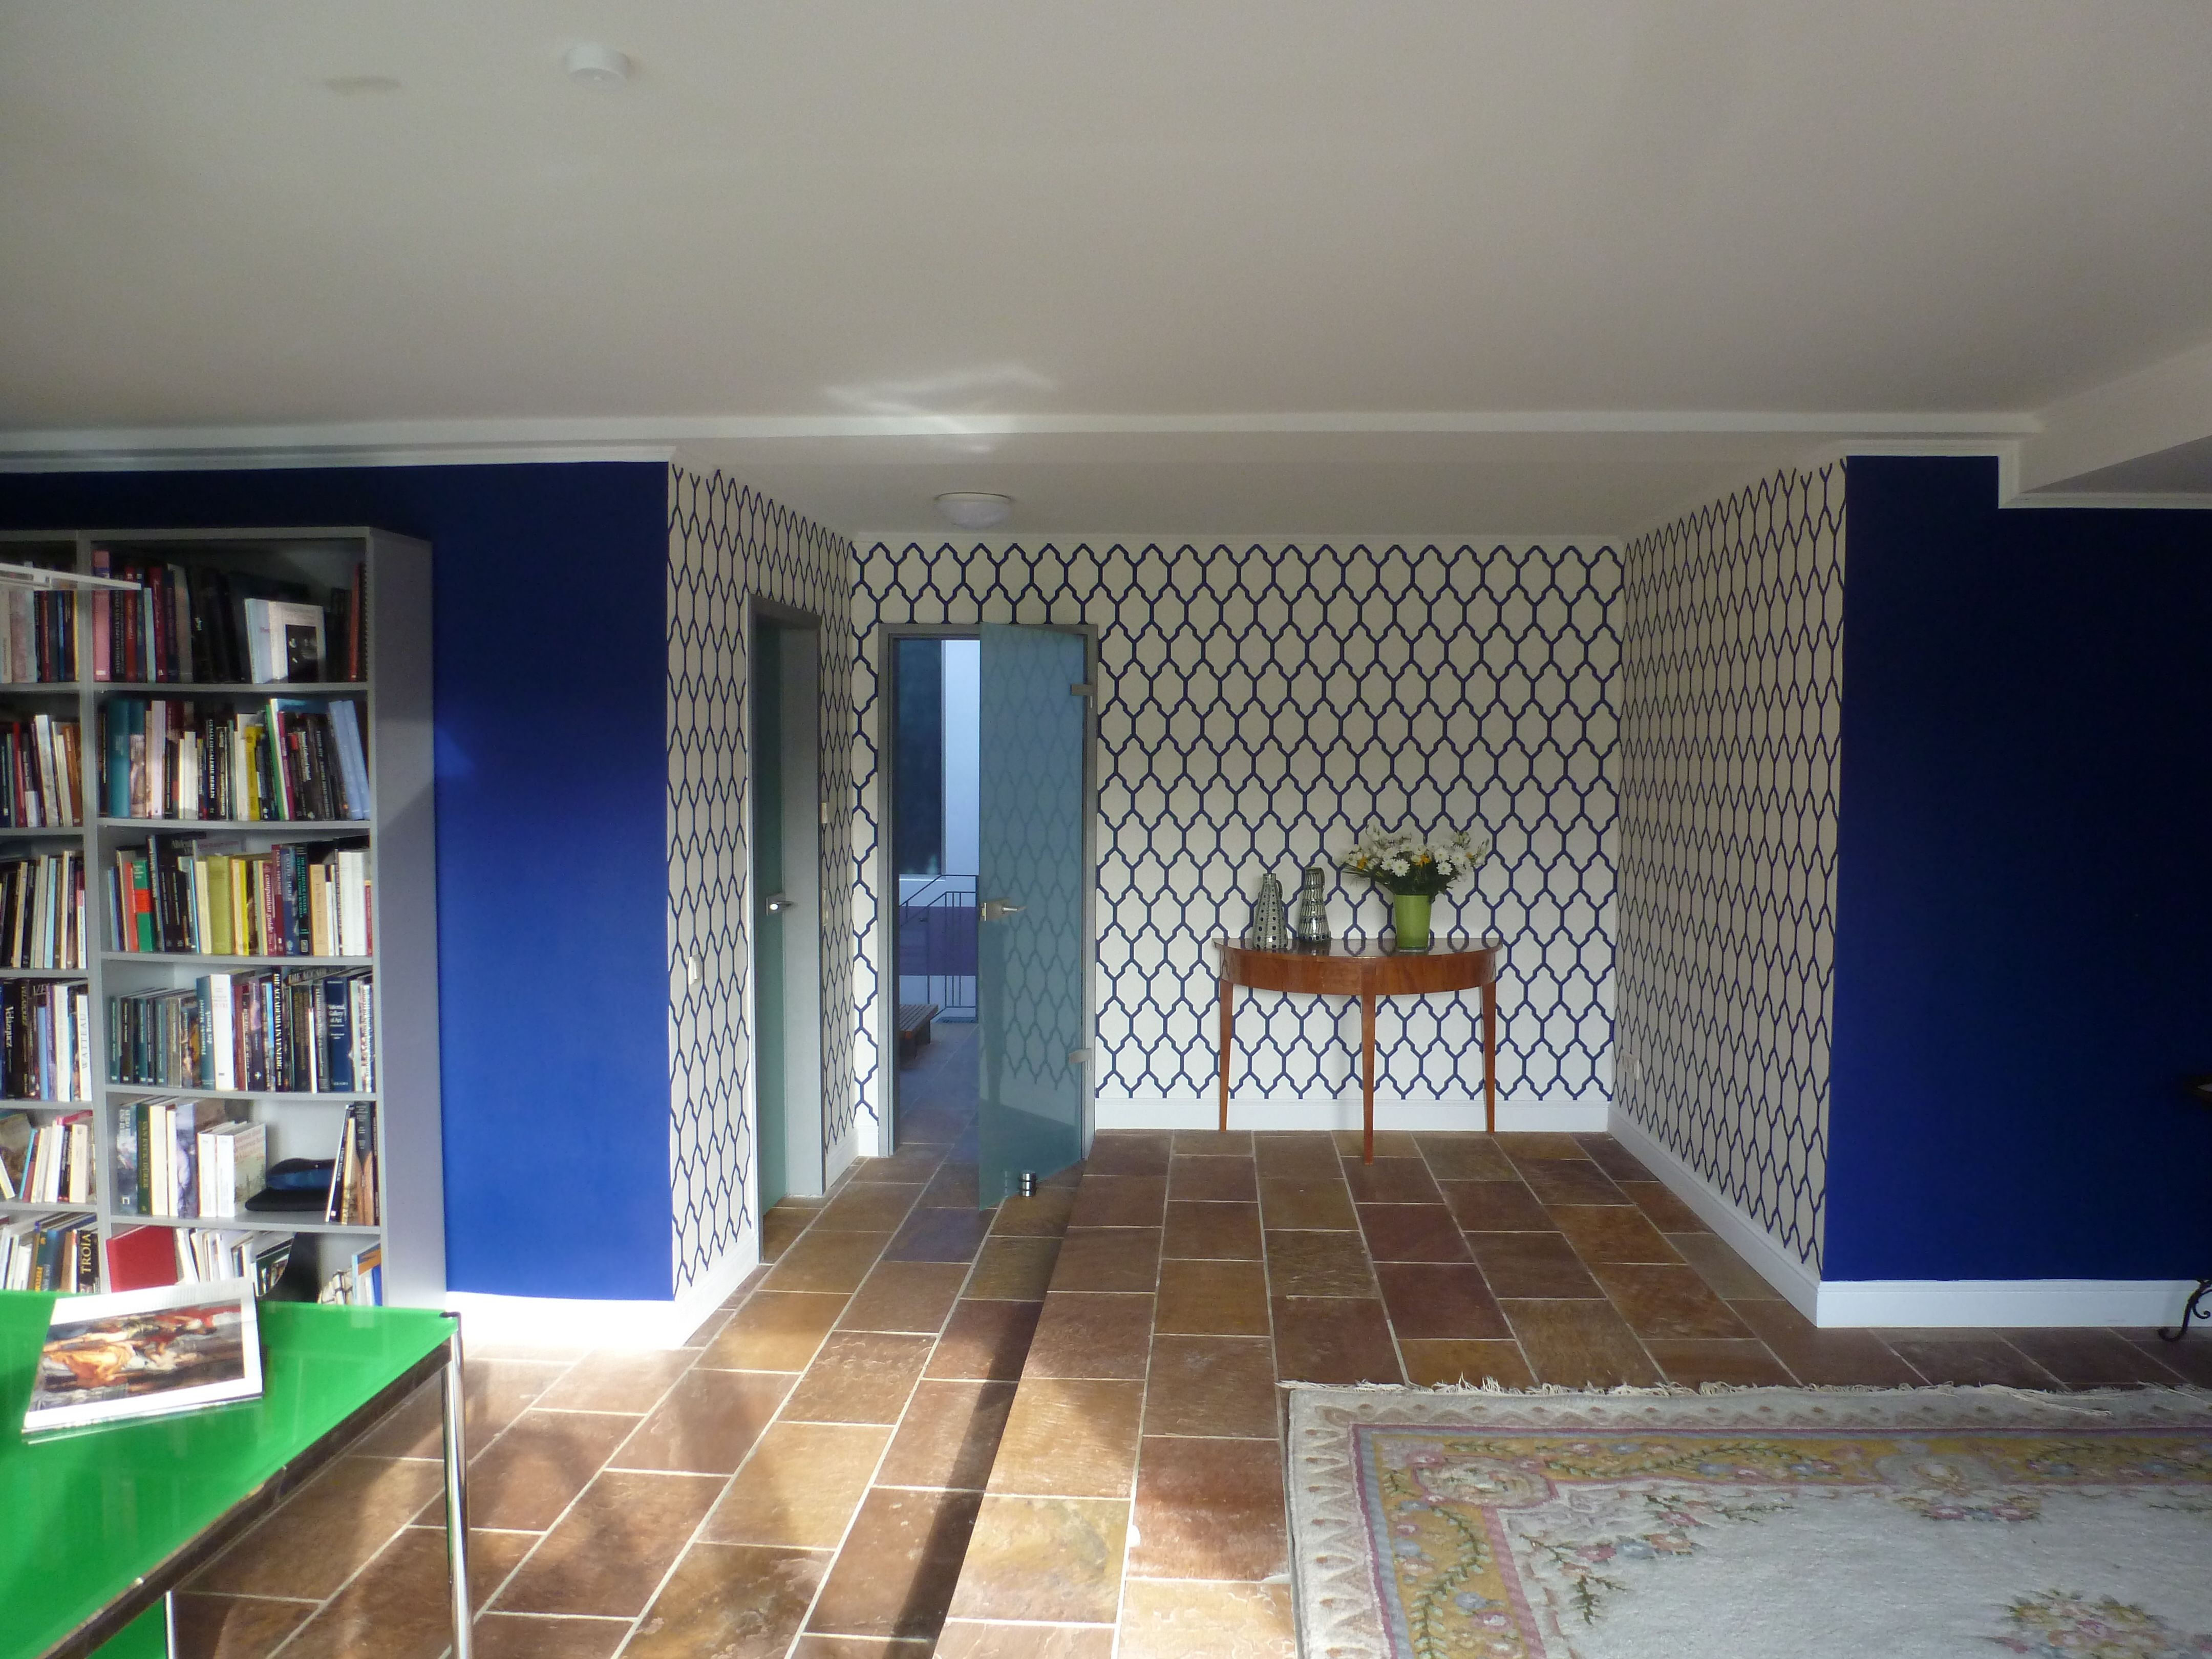 Tessella Bp 3604 Room Colors Interior Inspiration Farrow Ball